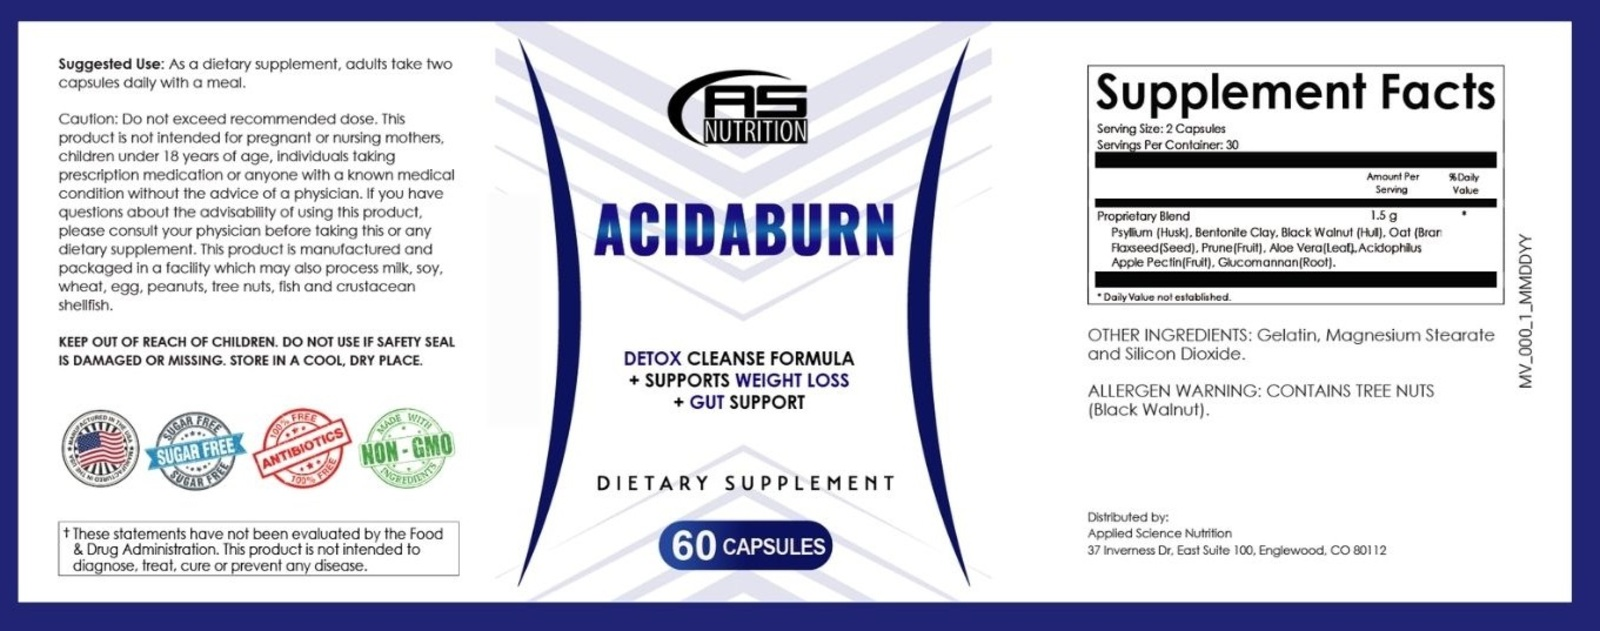 acidaburn ingredients label